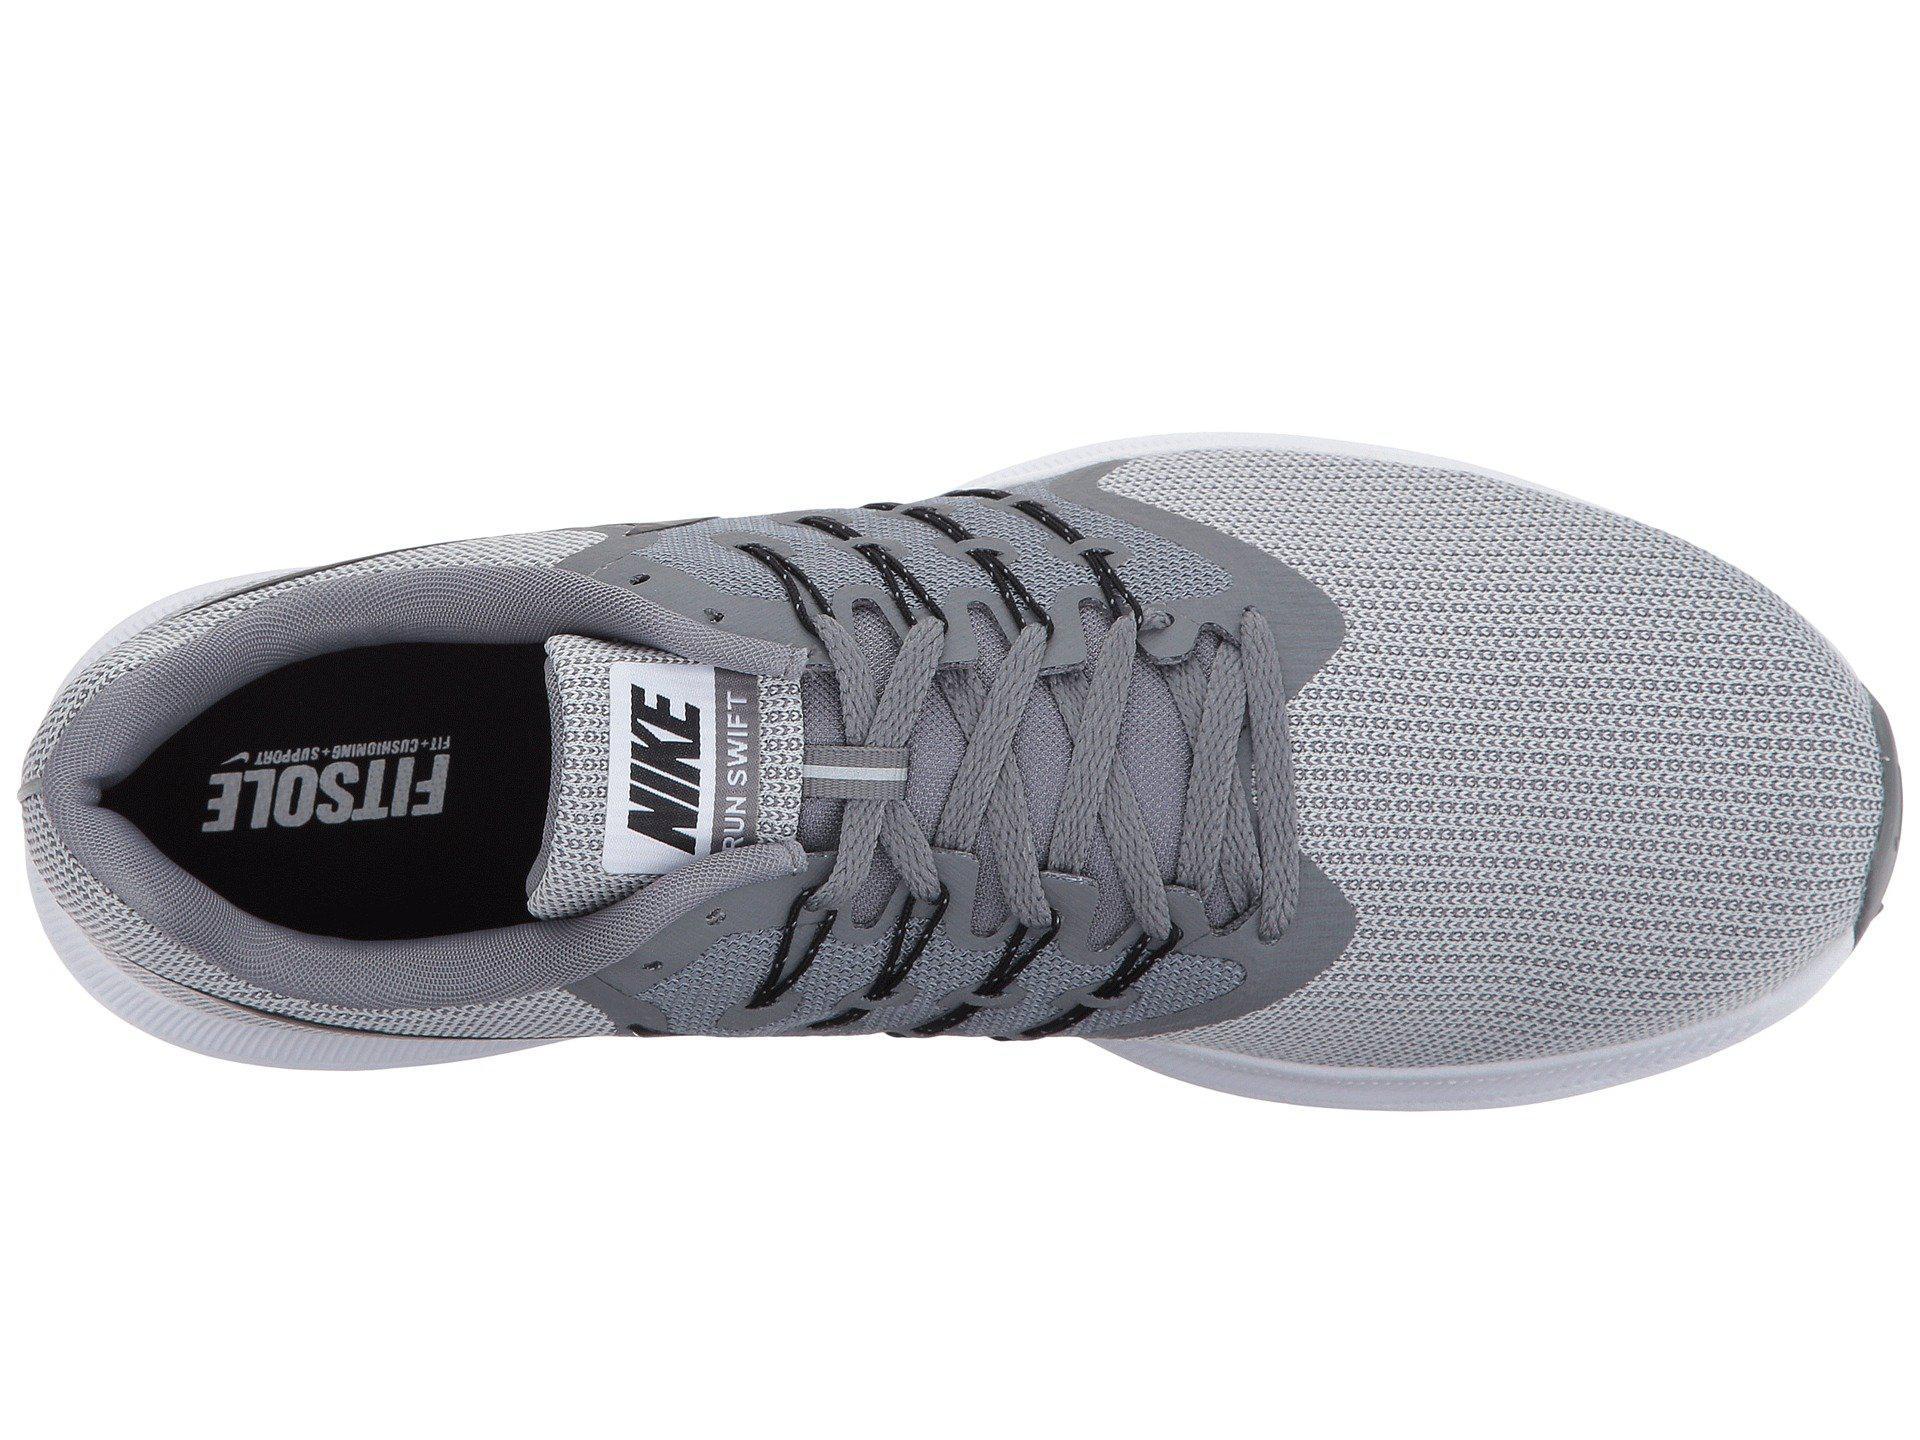 4830bea6d24786 Nike Run Swift Wolf Grey Green Men Running Shoes Sneakers Trainers